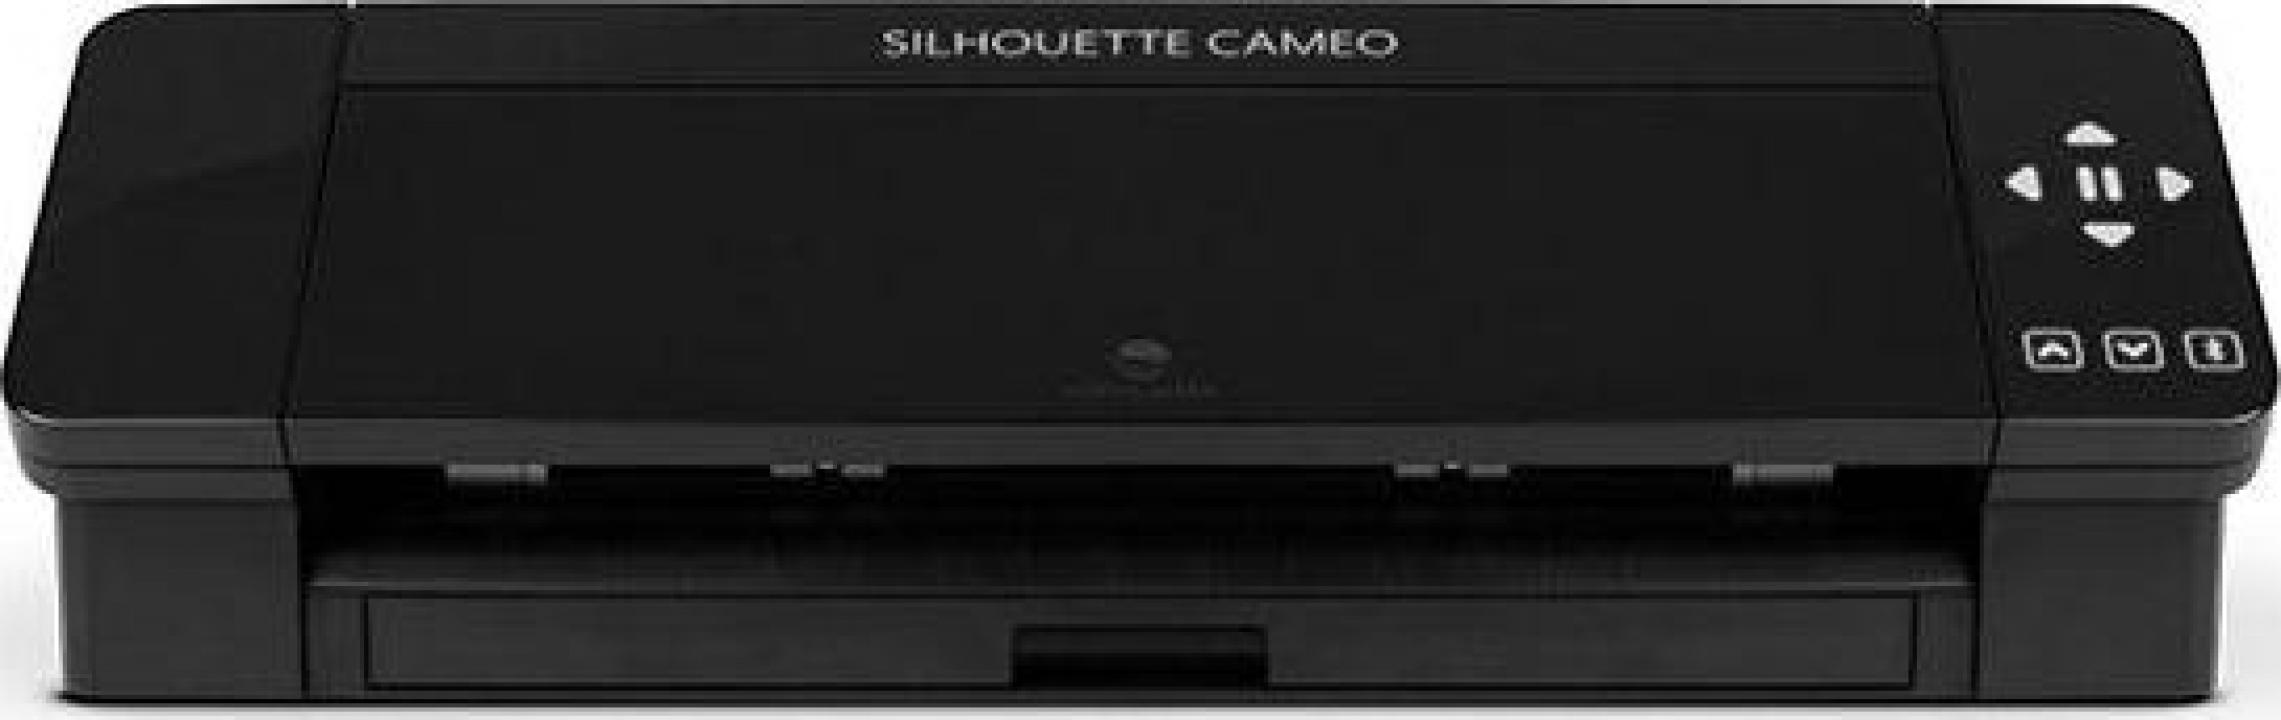 Cutter-plotter Silhouette Cameo 4 negru